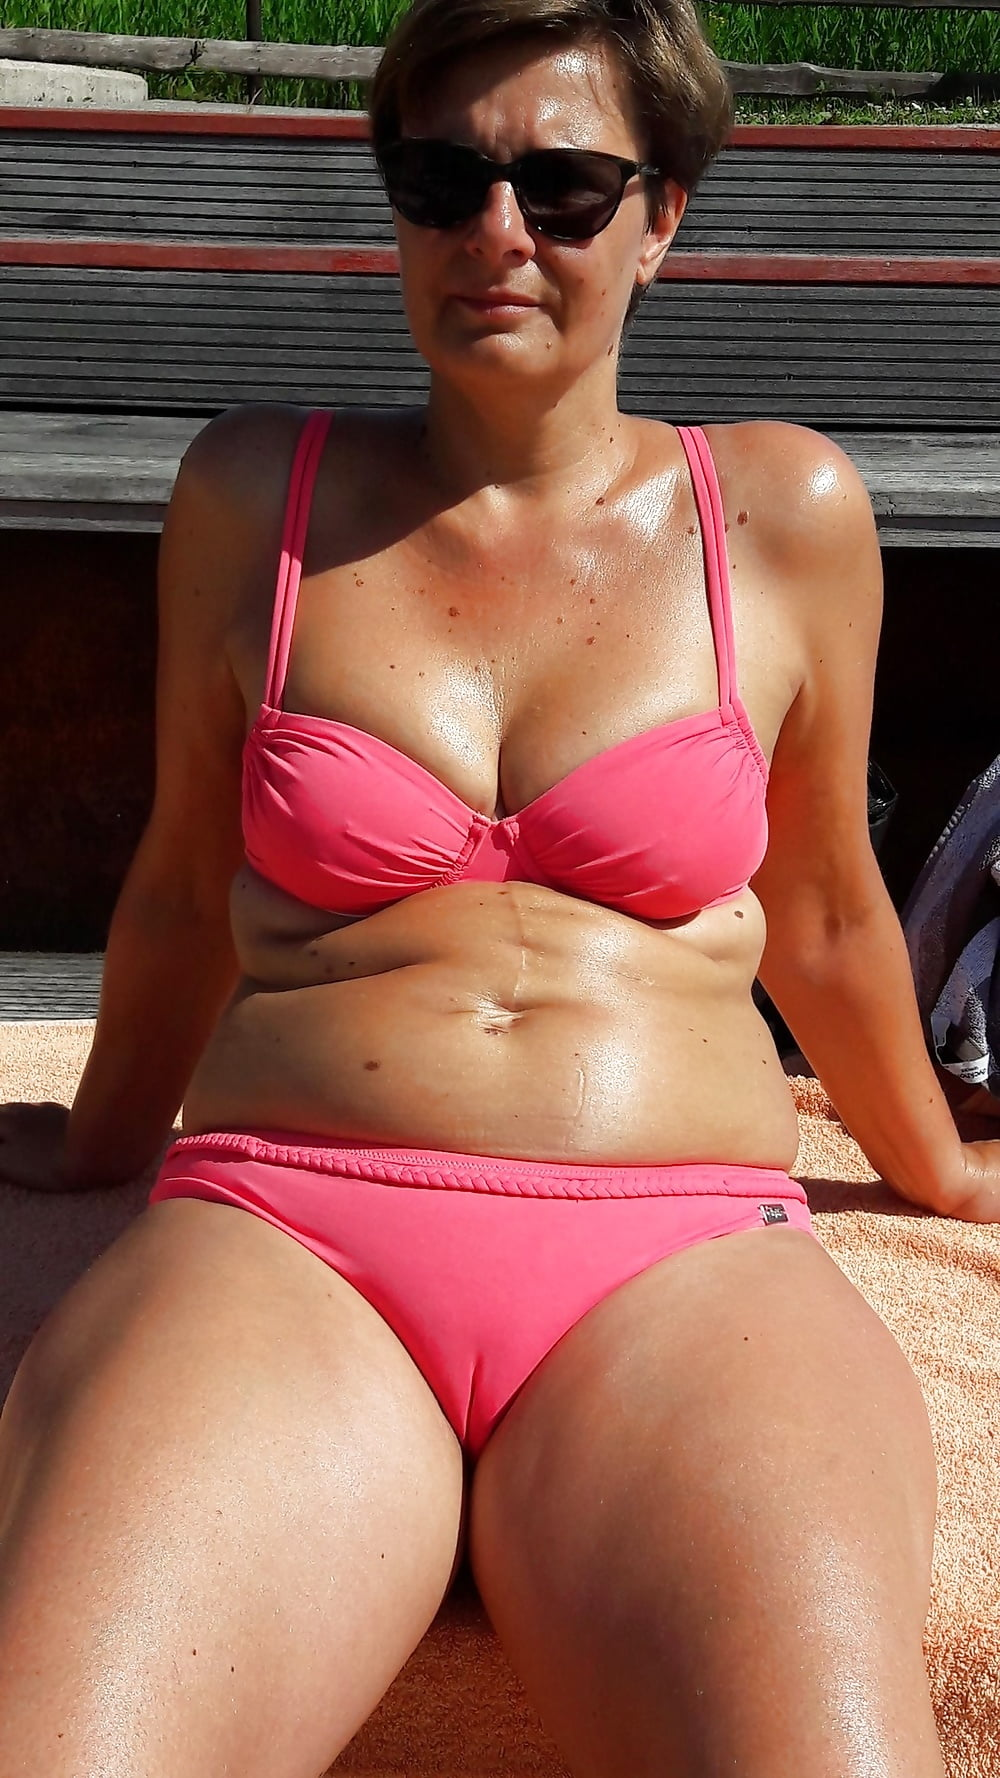 Hairy pussy bikini amateur, the hague russian embassy